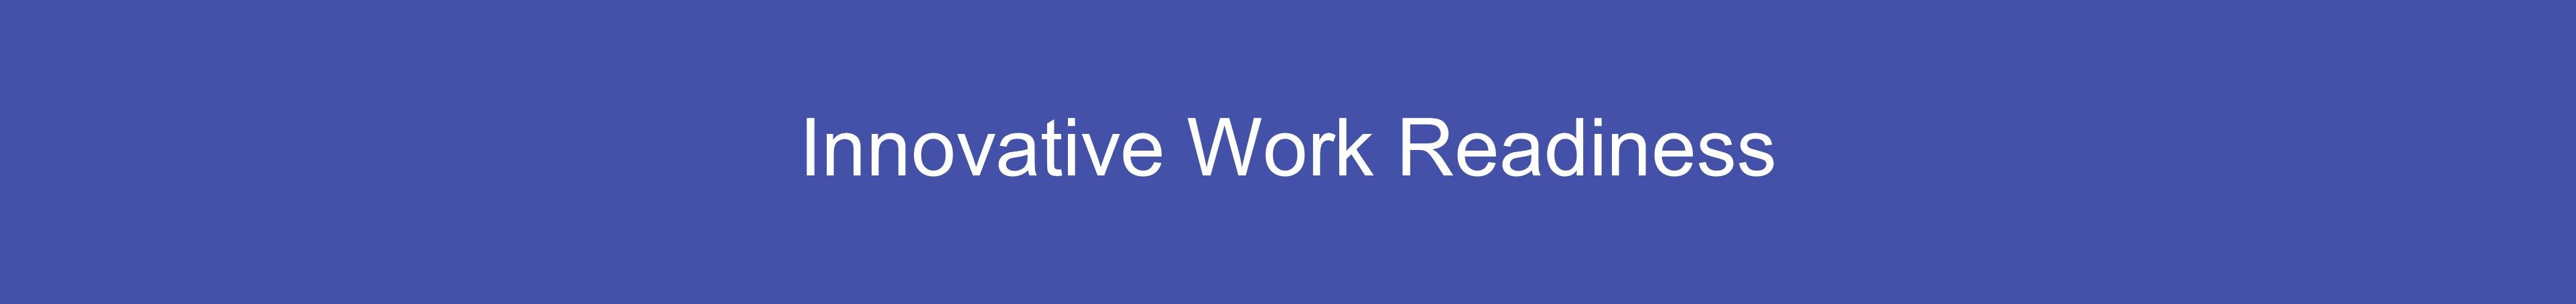 work_readiness_banner.jpg